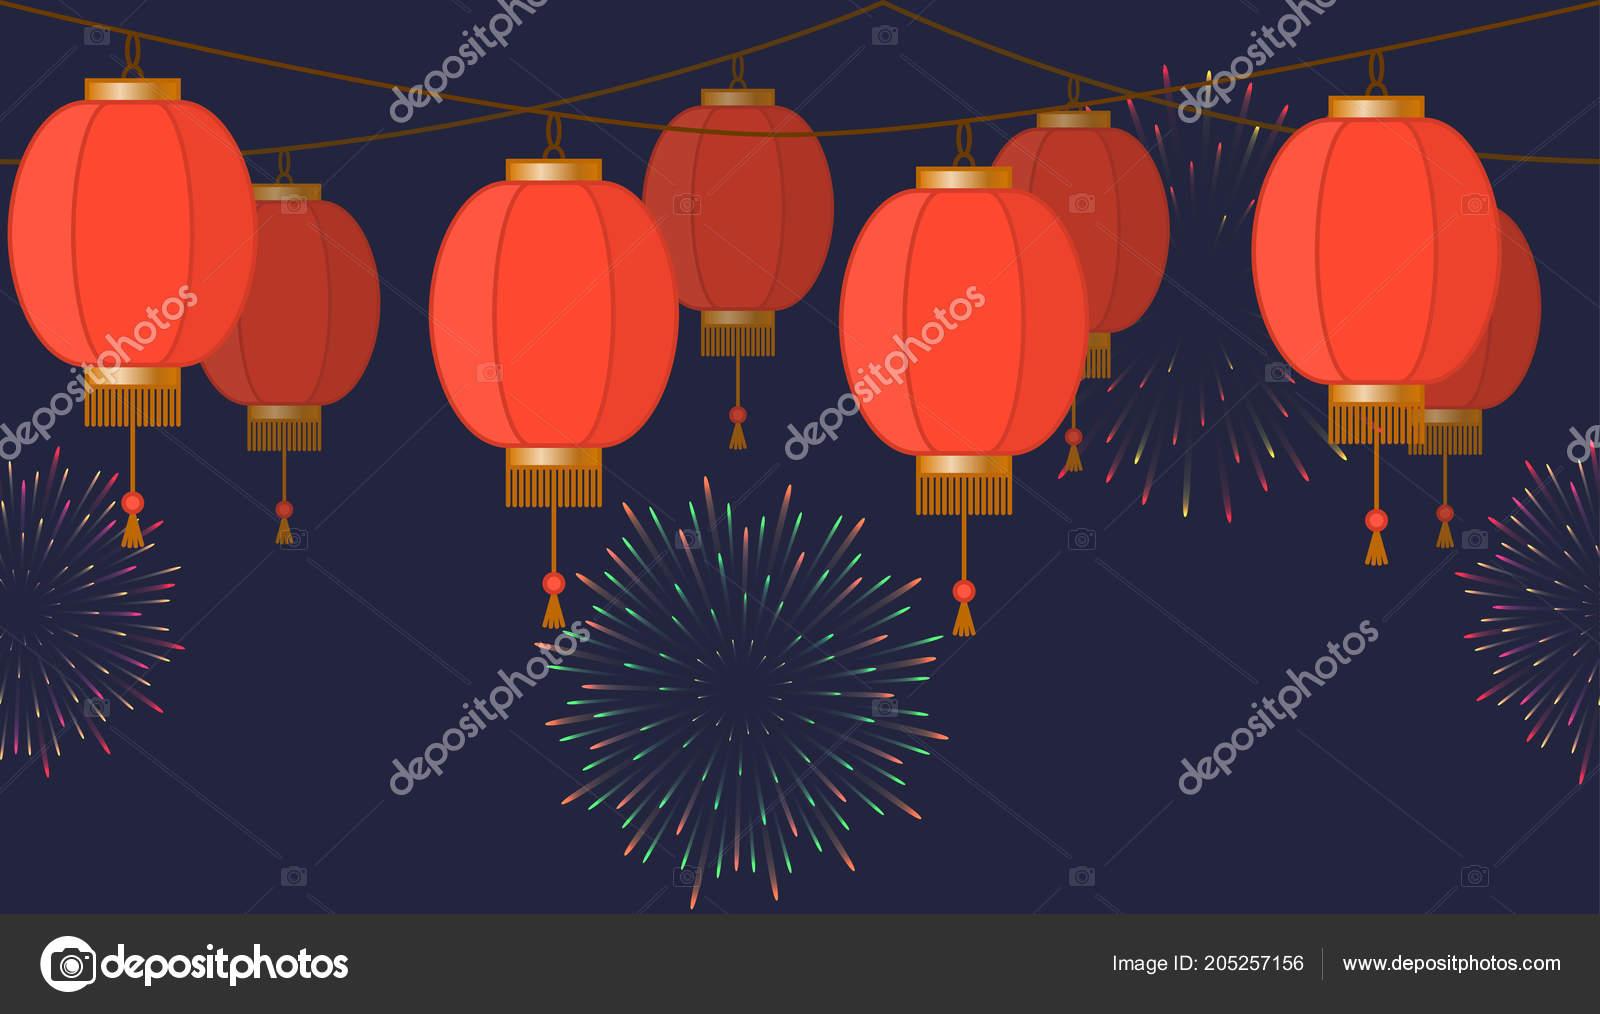 Lampade Cinesi Di Carta.Ghirlanda Con Lanterne Cinesi Catena Lampade Di Carta